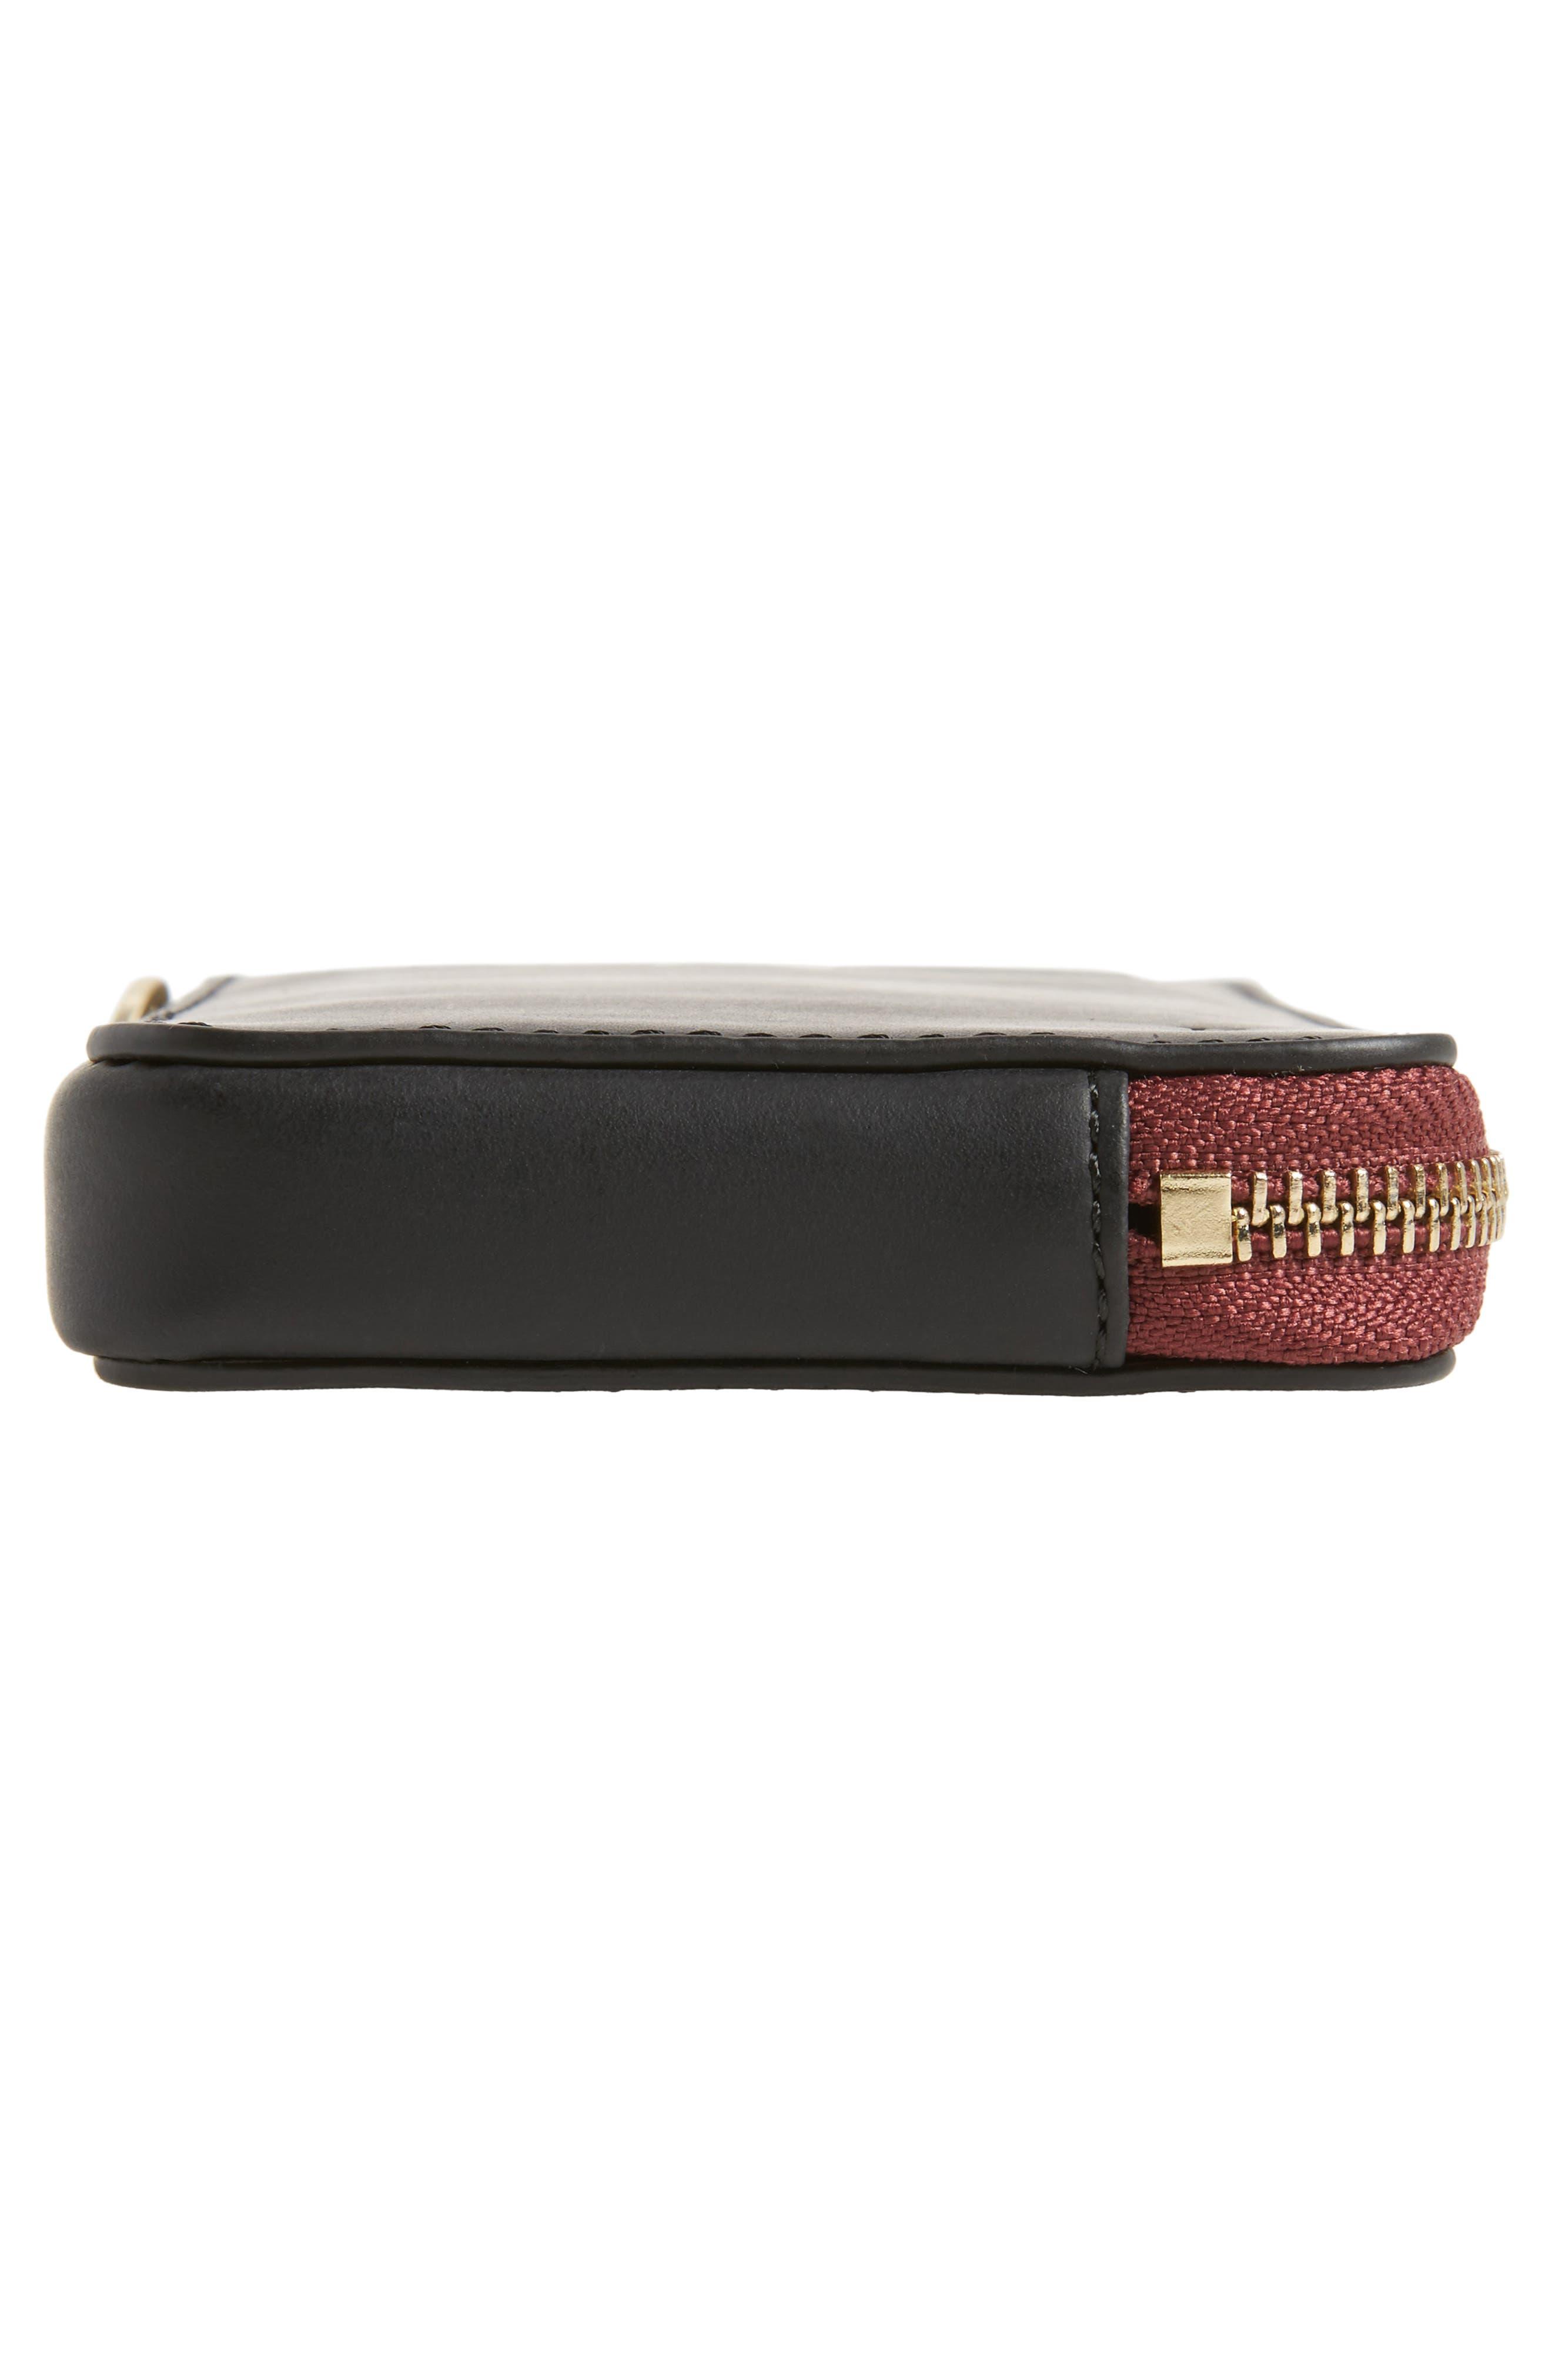 Brea Convertible Smartphone Leather Clutch,                             Alternate thumbnail 6, color,                             001